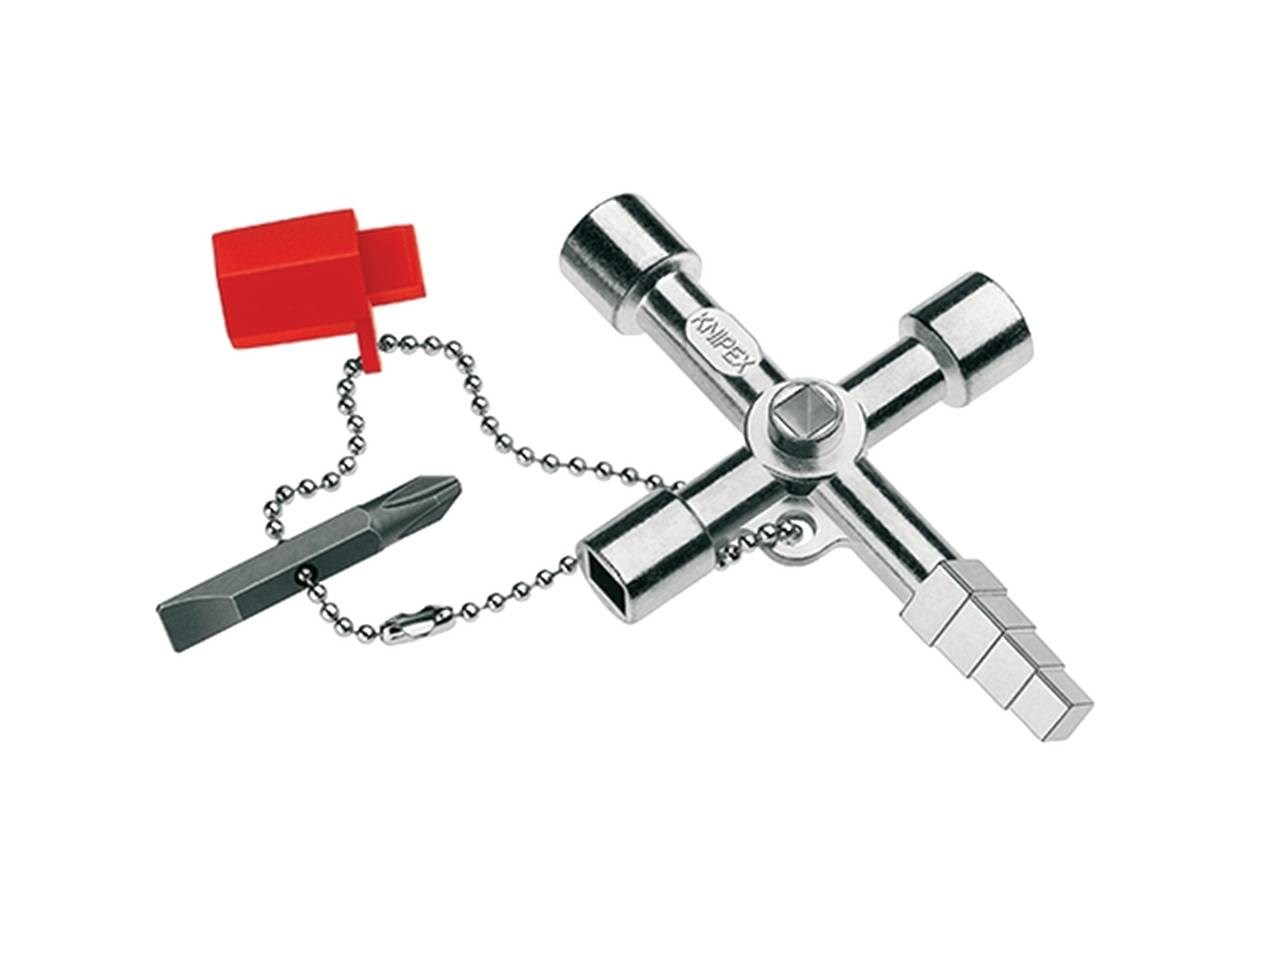 Knipex Kpx001104 Profi Key Professional Control Cabinet